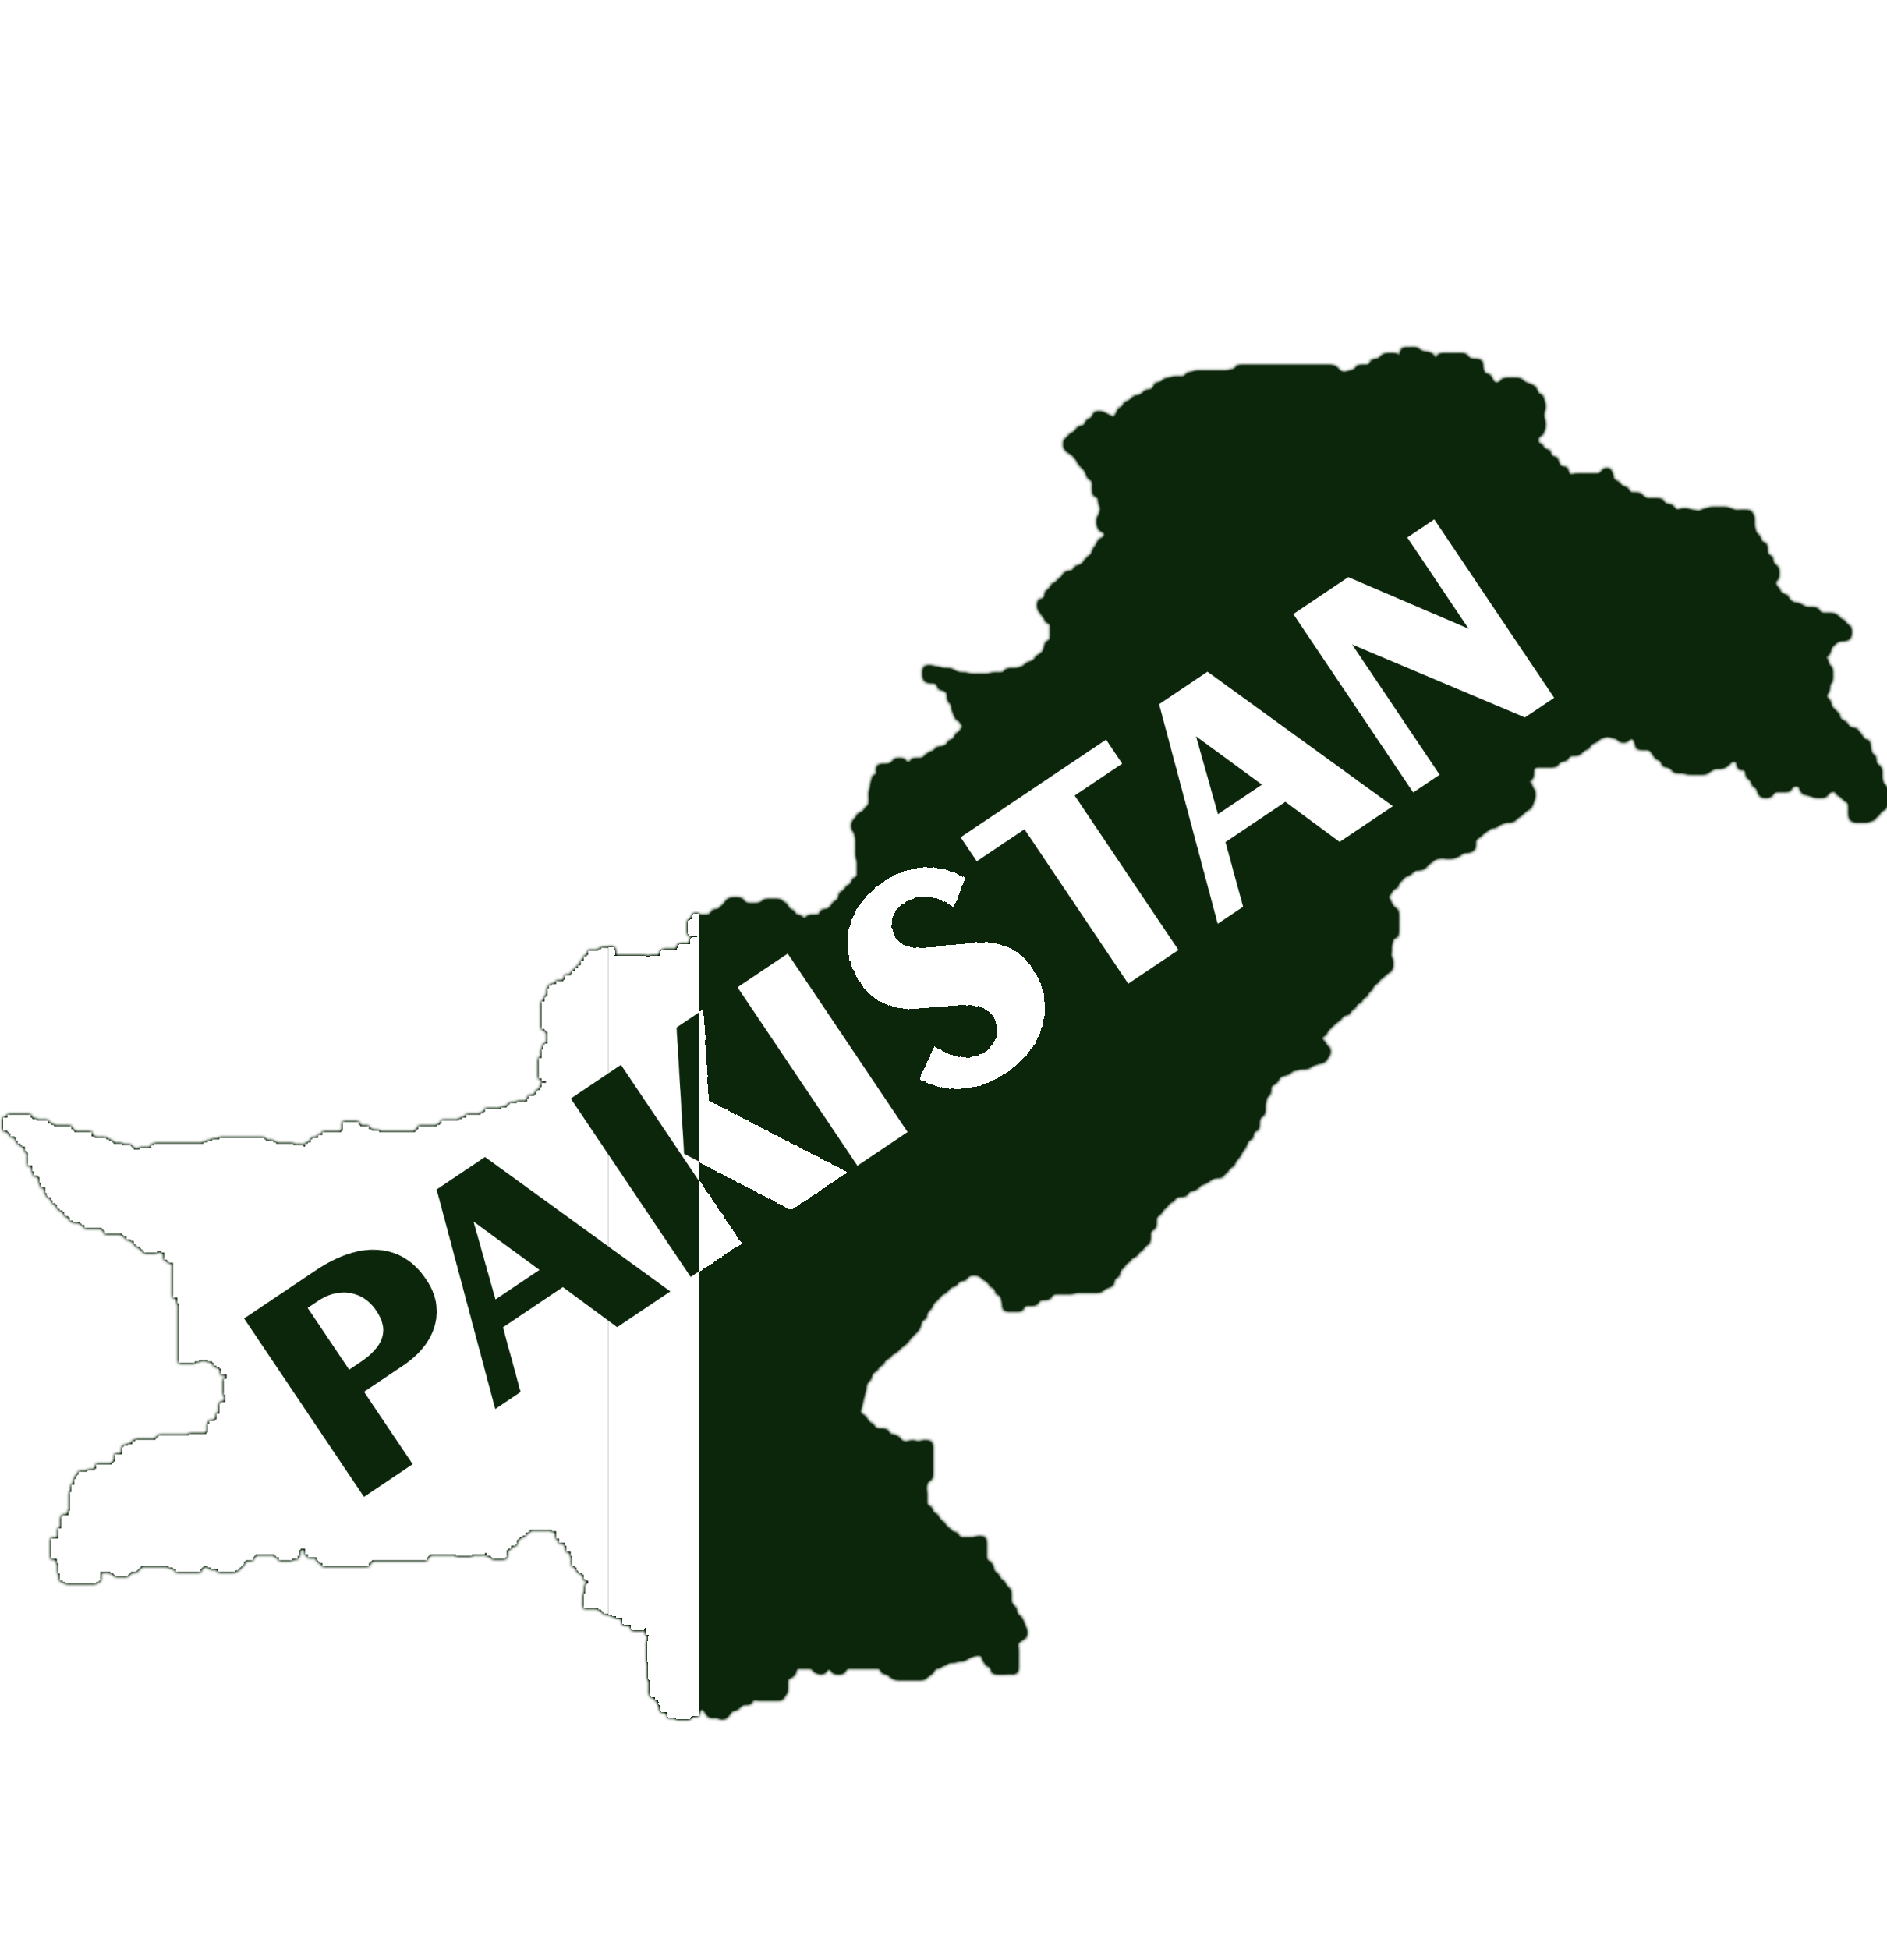 pakistan map pakistan flag pakistan flag in map pakistan